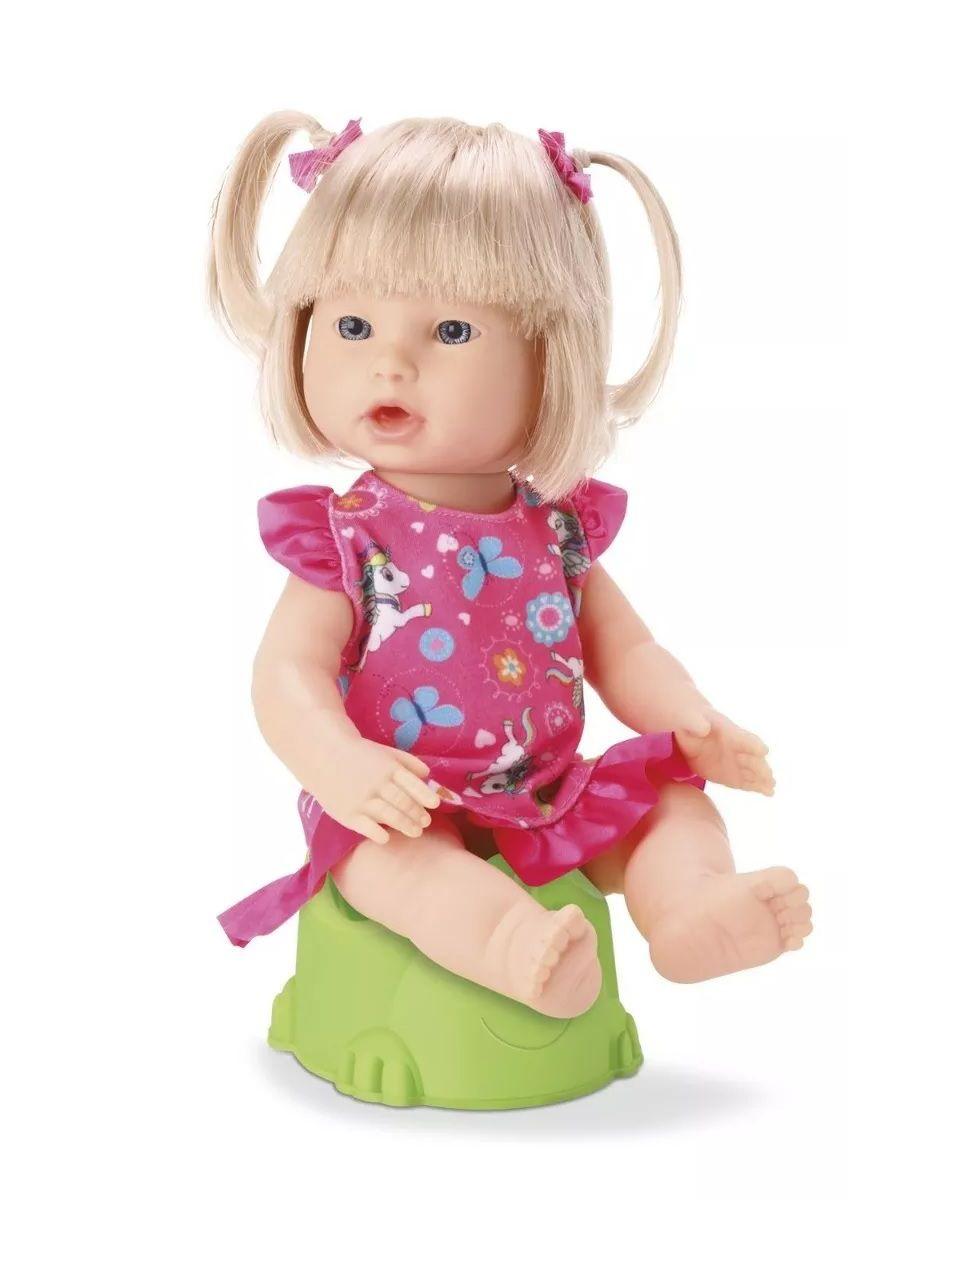 Boneca Diver Dolls Bebê Peniquinho - Diver Toys